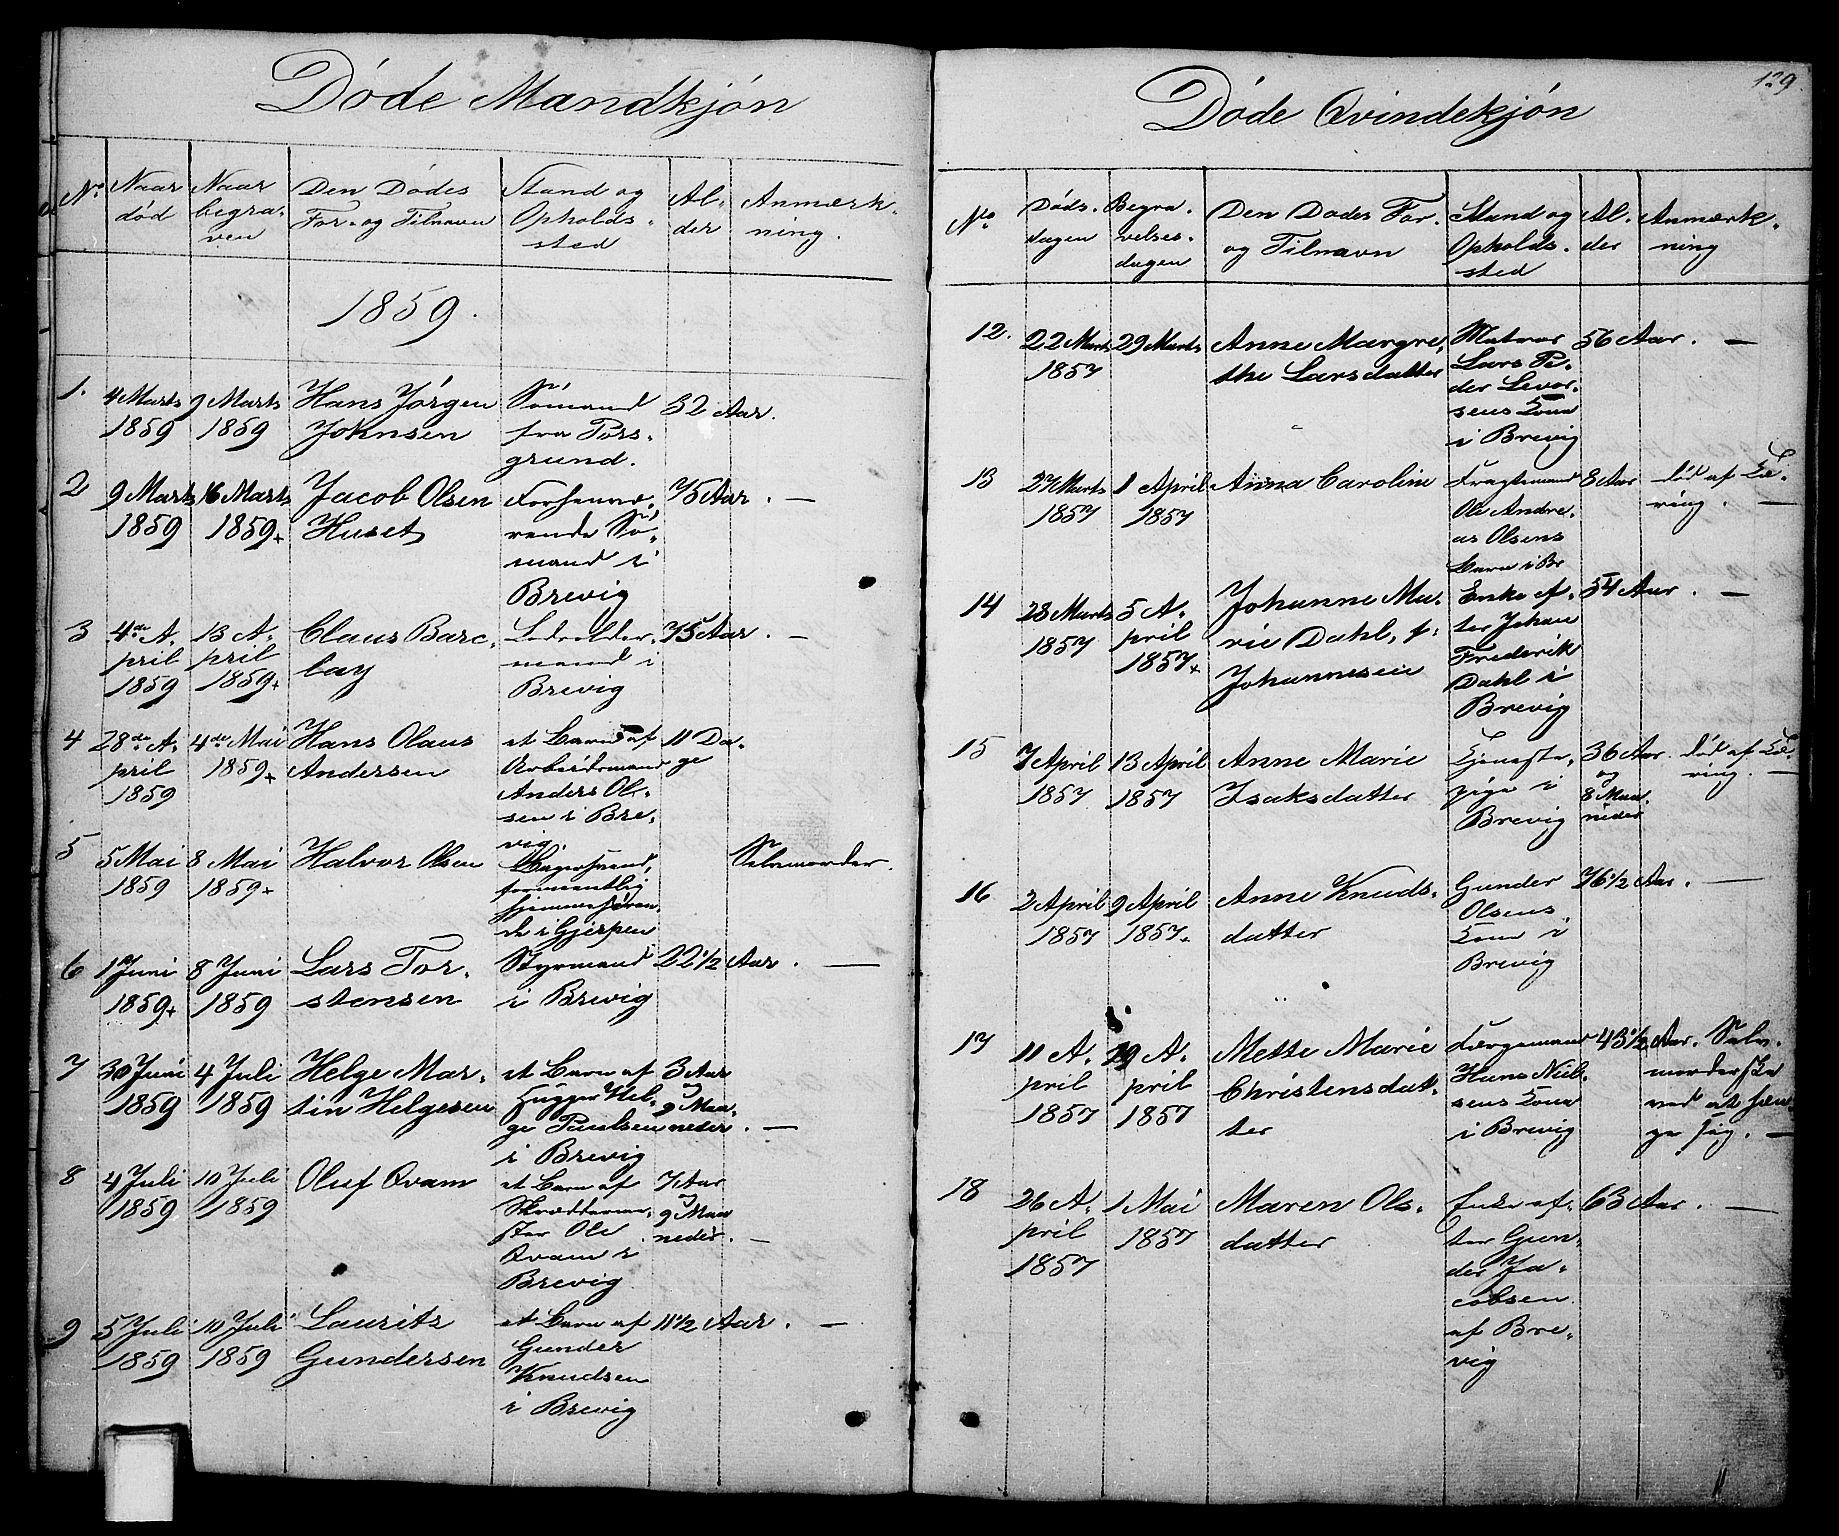 SAKO, Brevik kirkebøker, G/Ga/L0002: Klokkerbok nr. 2, 1846-1865, s. 129